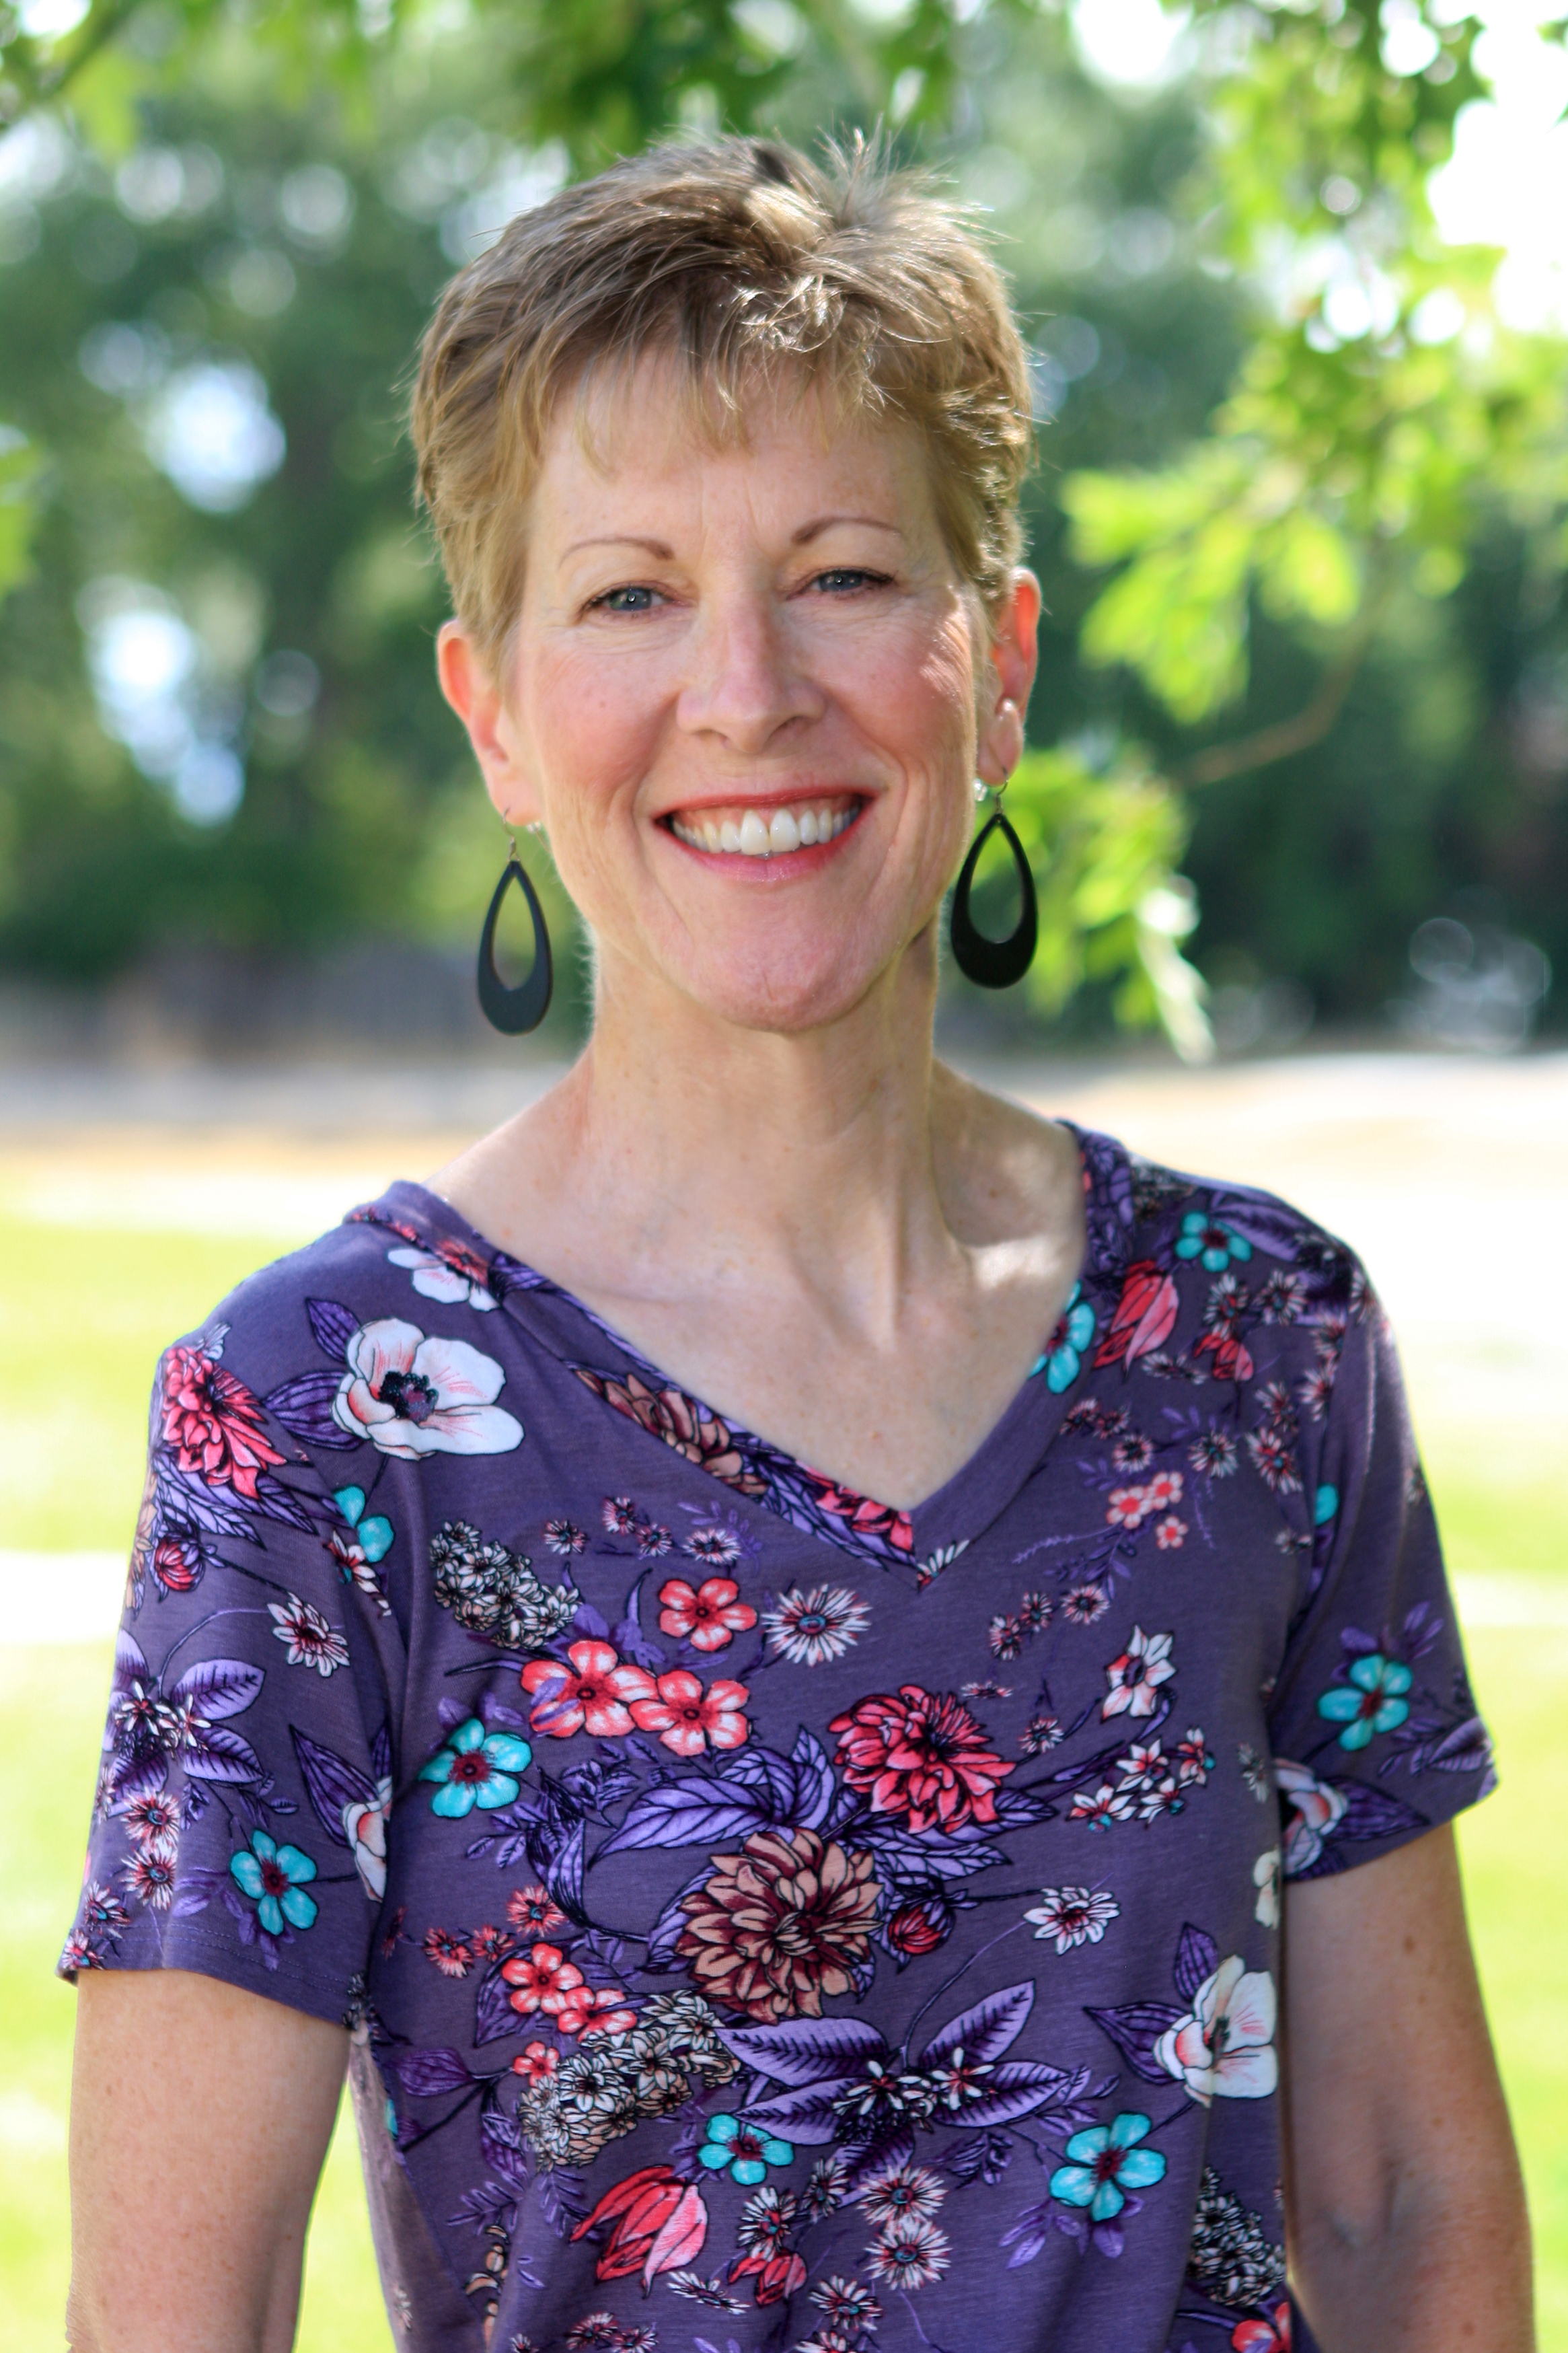 <p><strong>Ruth Ann Criner</strong><br>Teacher<br><a href=mailto:ruthannc@ndaemail.com>ruthannc@ndaemail.com</a></p>